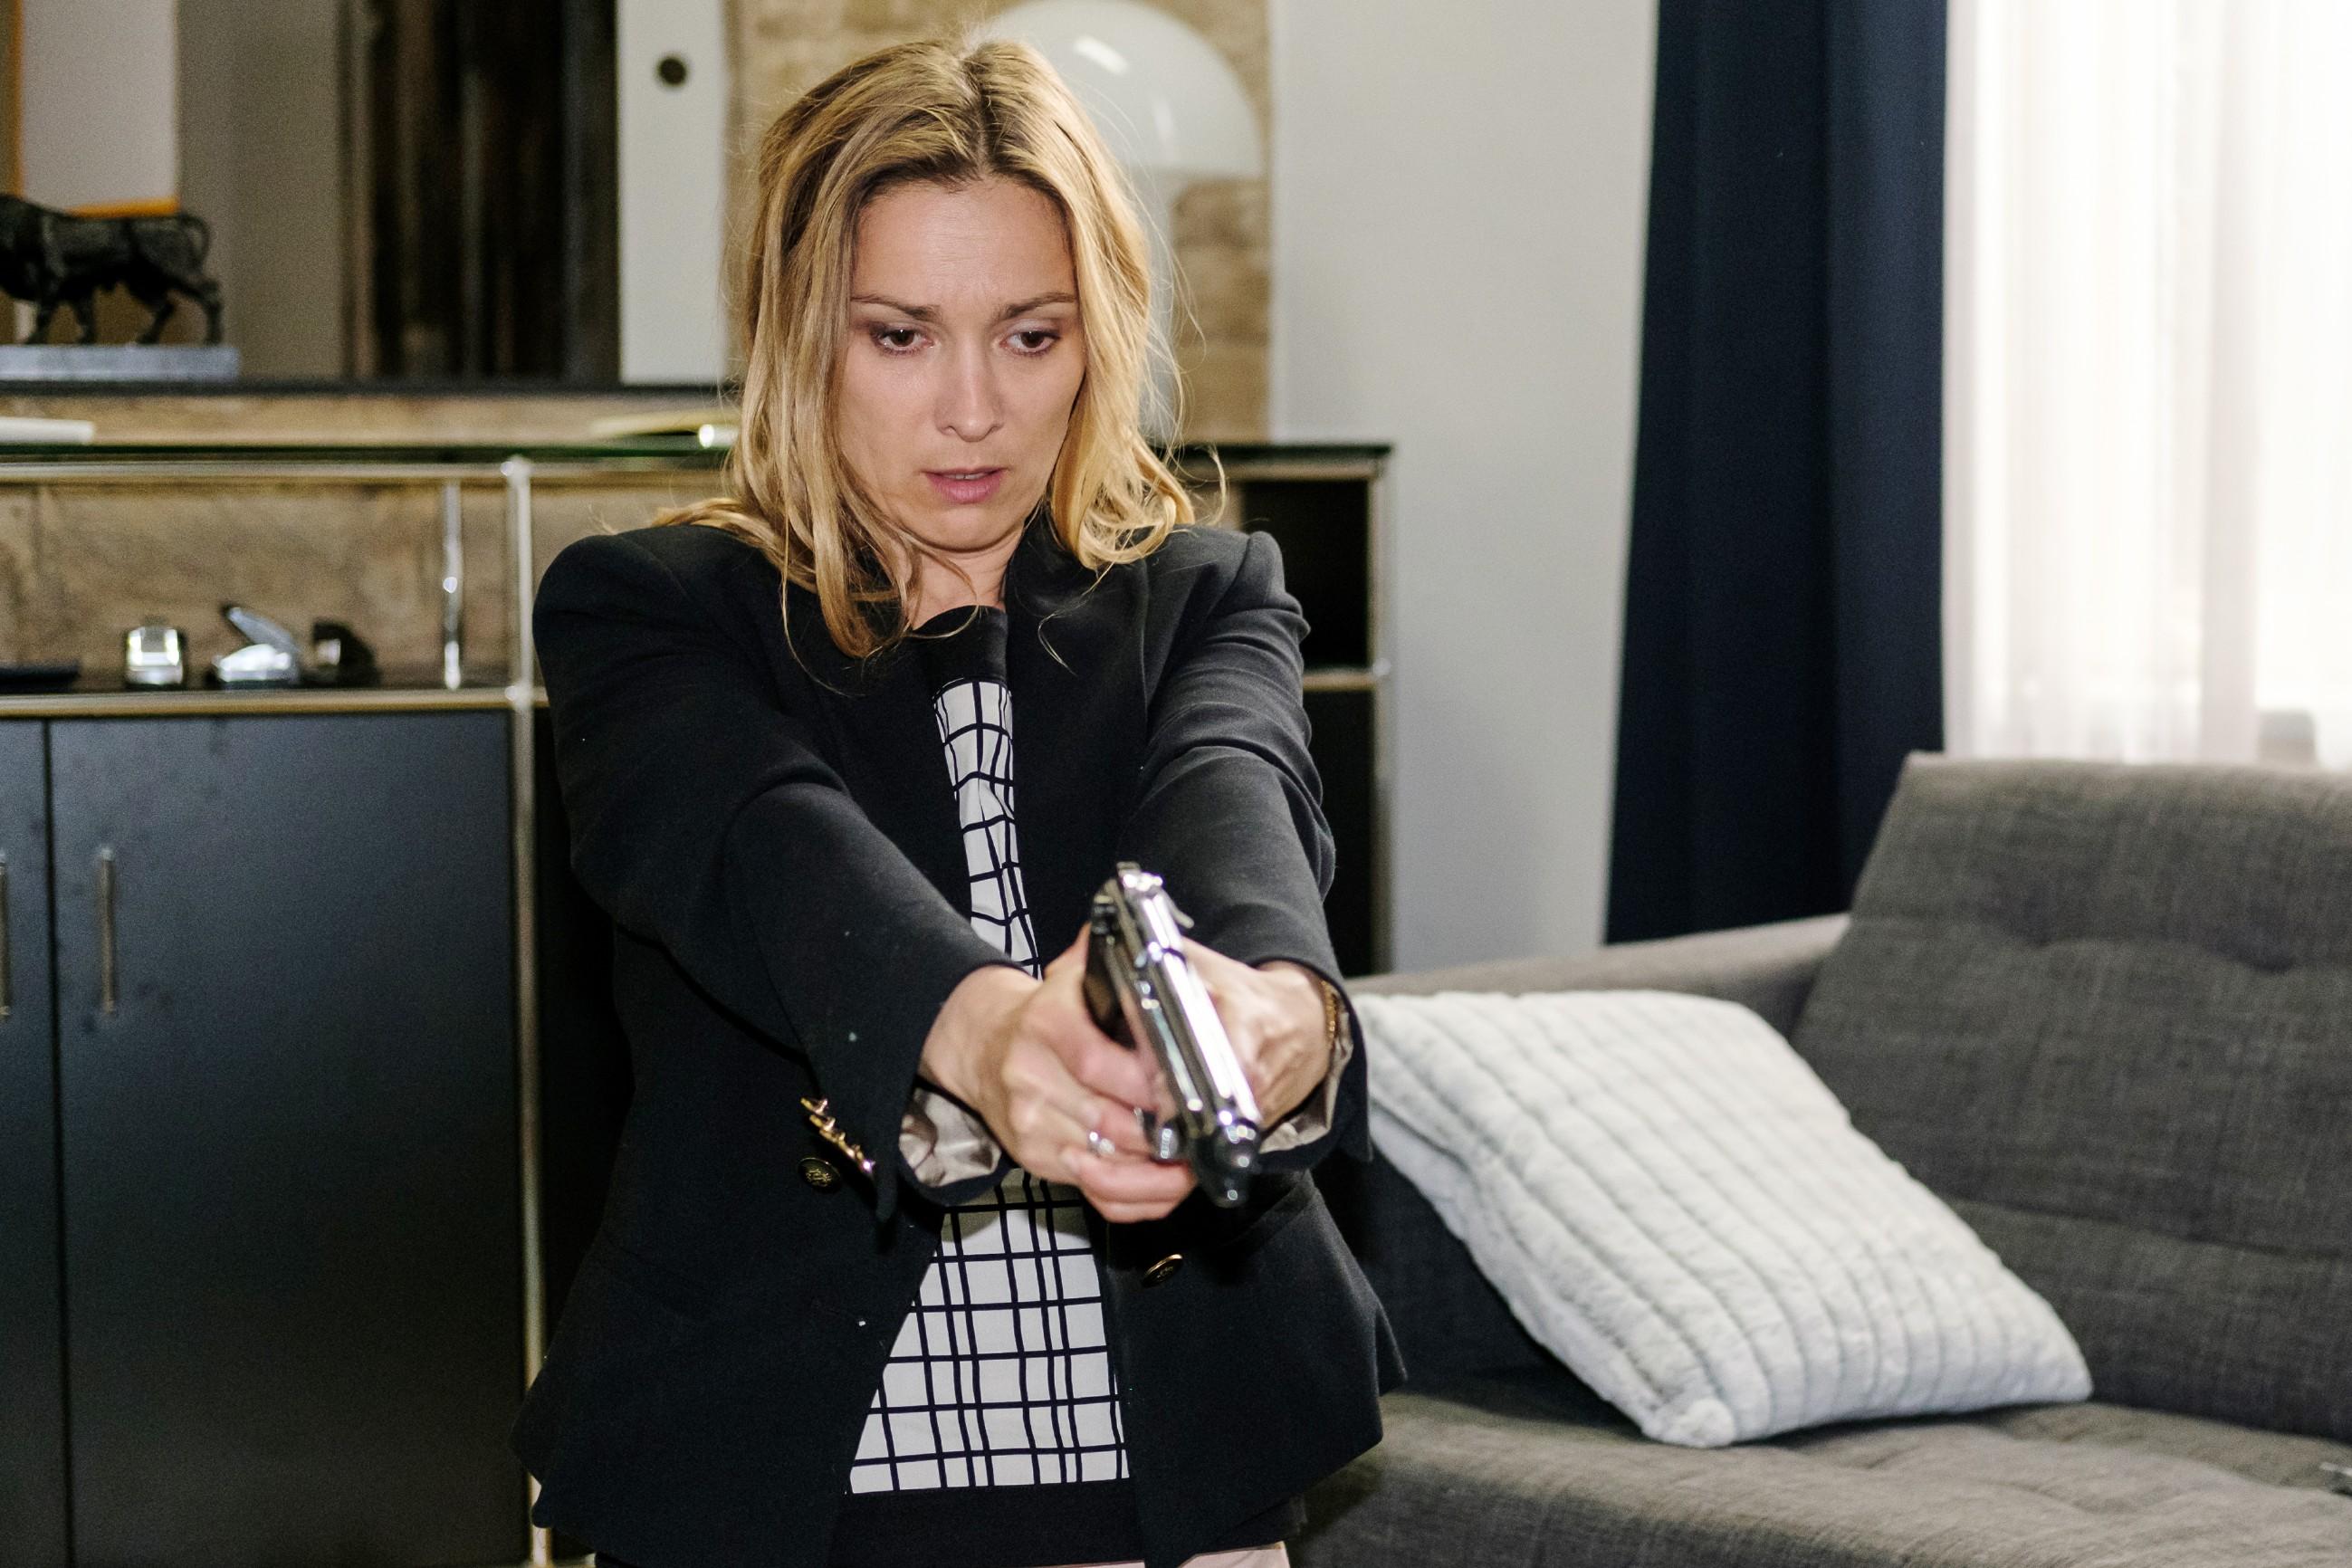 Andrea (Astrid Leberti) realisiert geschockt, dass sie Opitz angeschossen hat... (Quelle: RTL / Stefan Behrens)